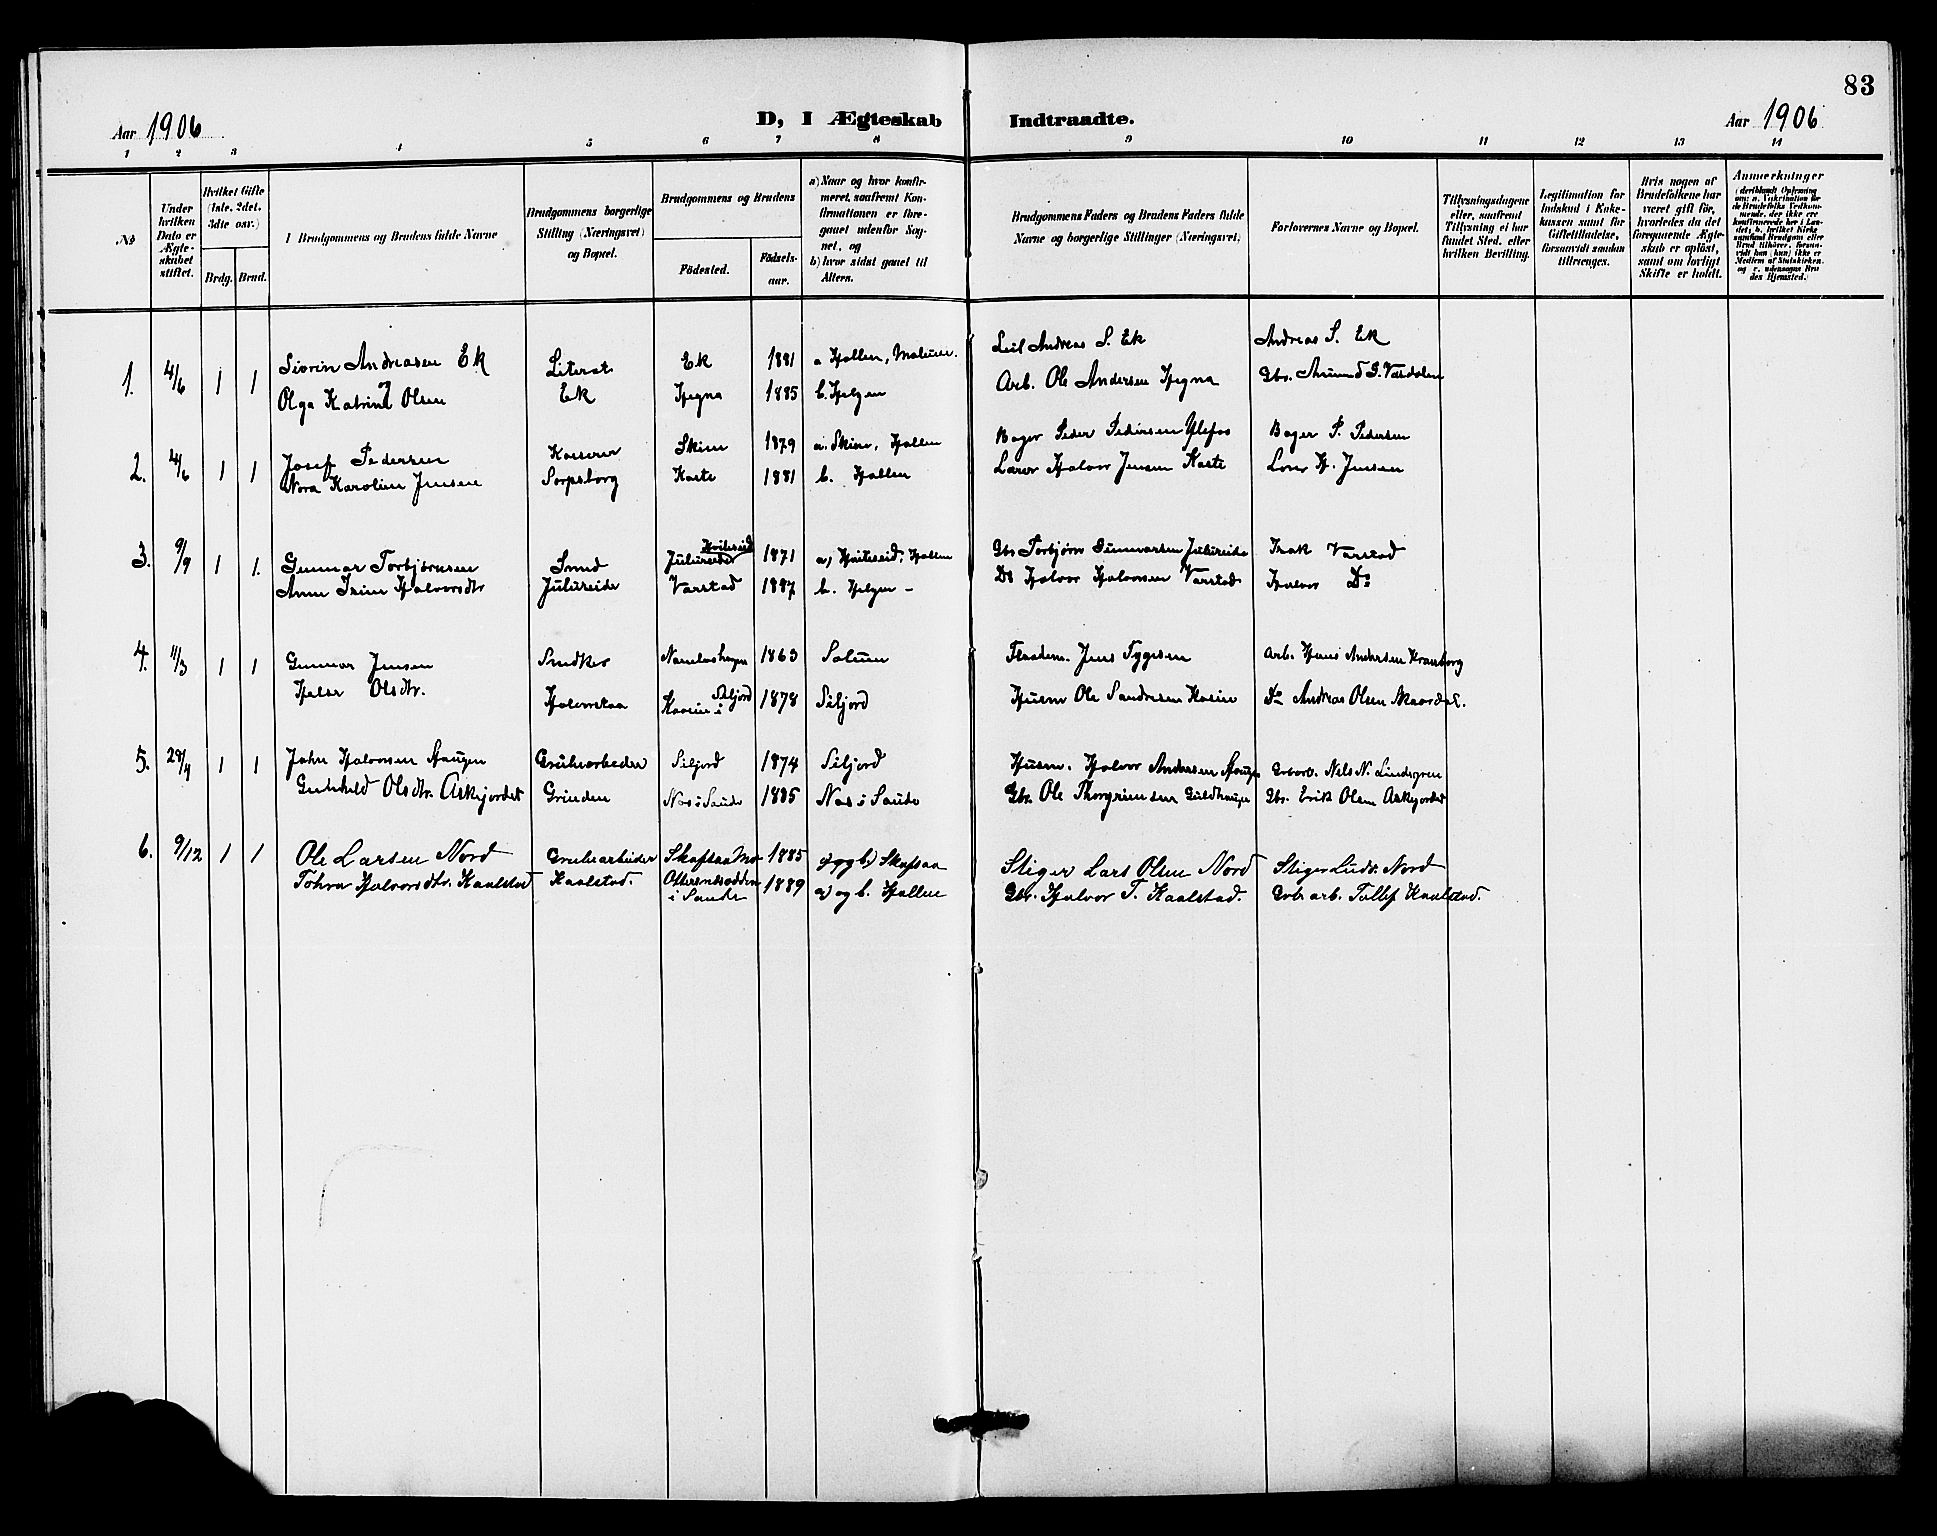 SAKO, Holla kirkebøker, G/Gb/L0002: Klokkerbok nr. II 2, 1897-1913, s. 83